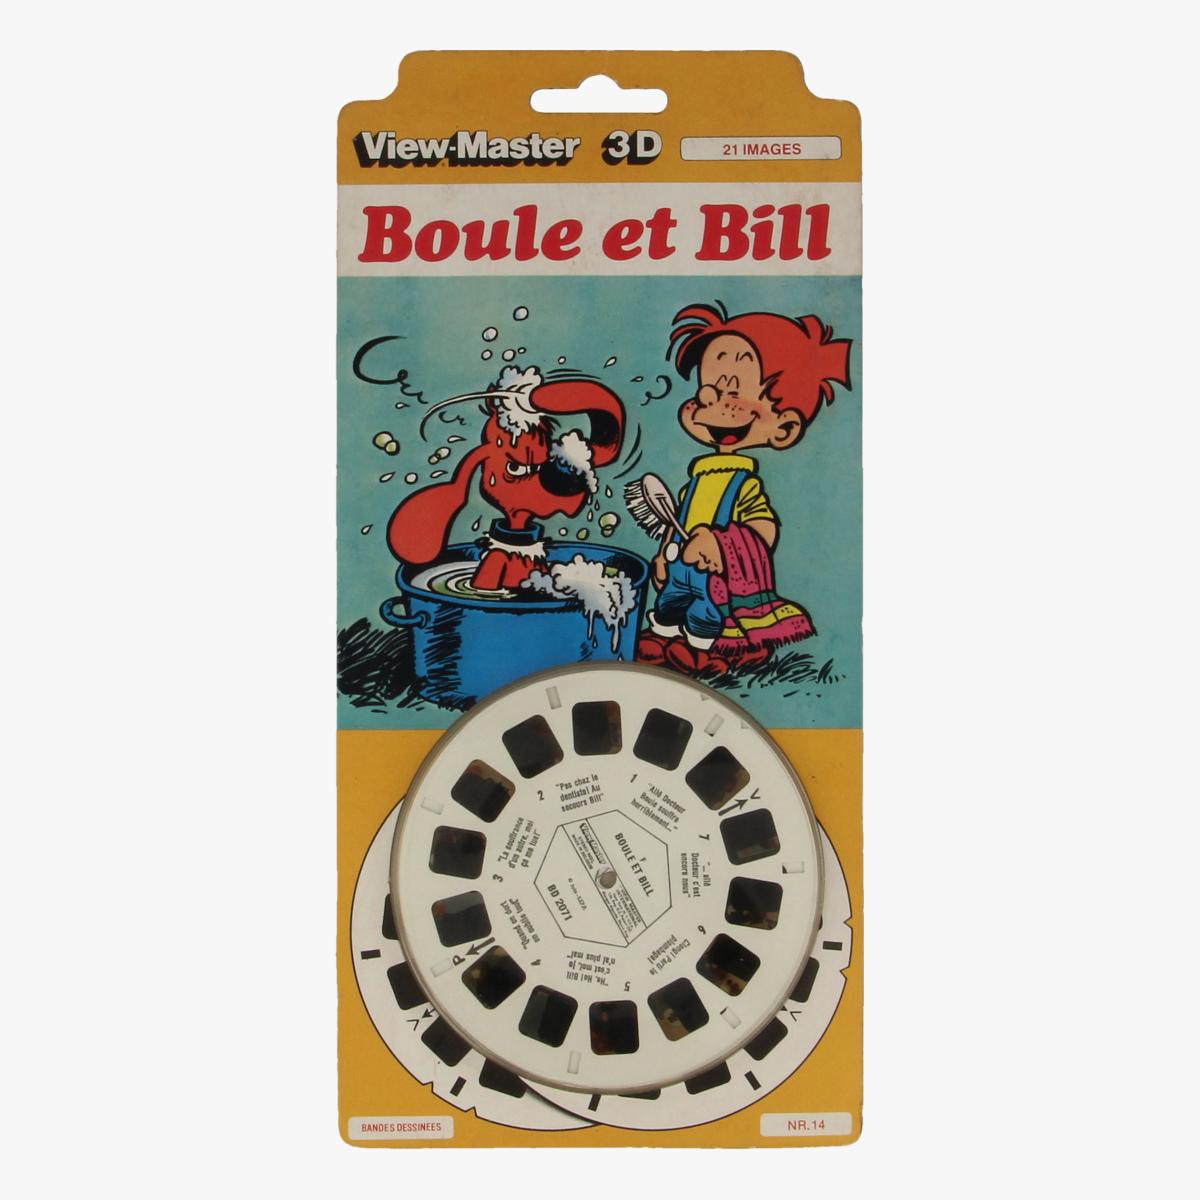 Afbeeldingen van View-master Boule et Bill Bandes Dessinees nr 14